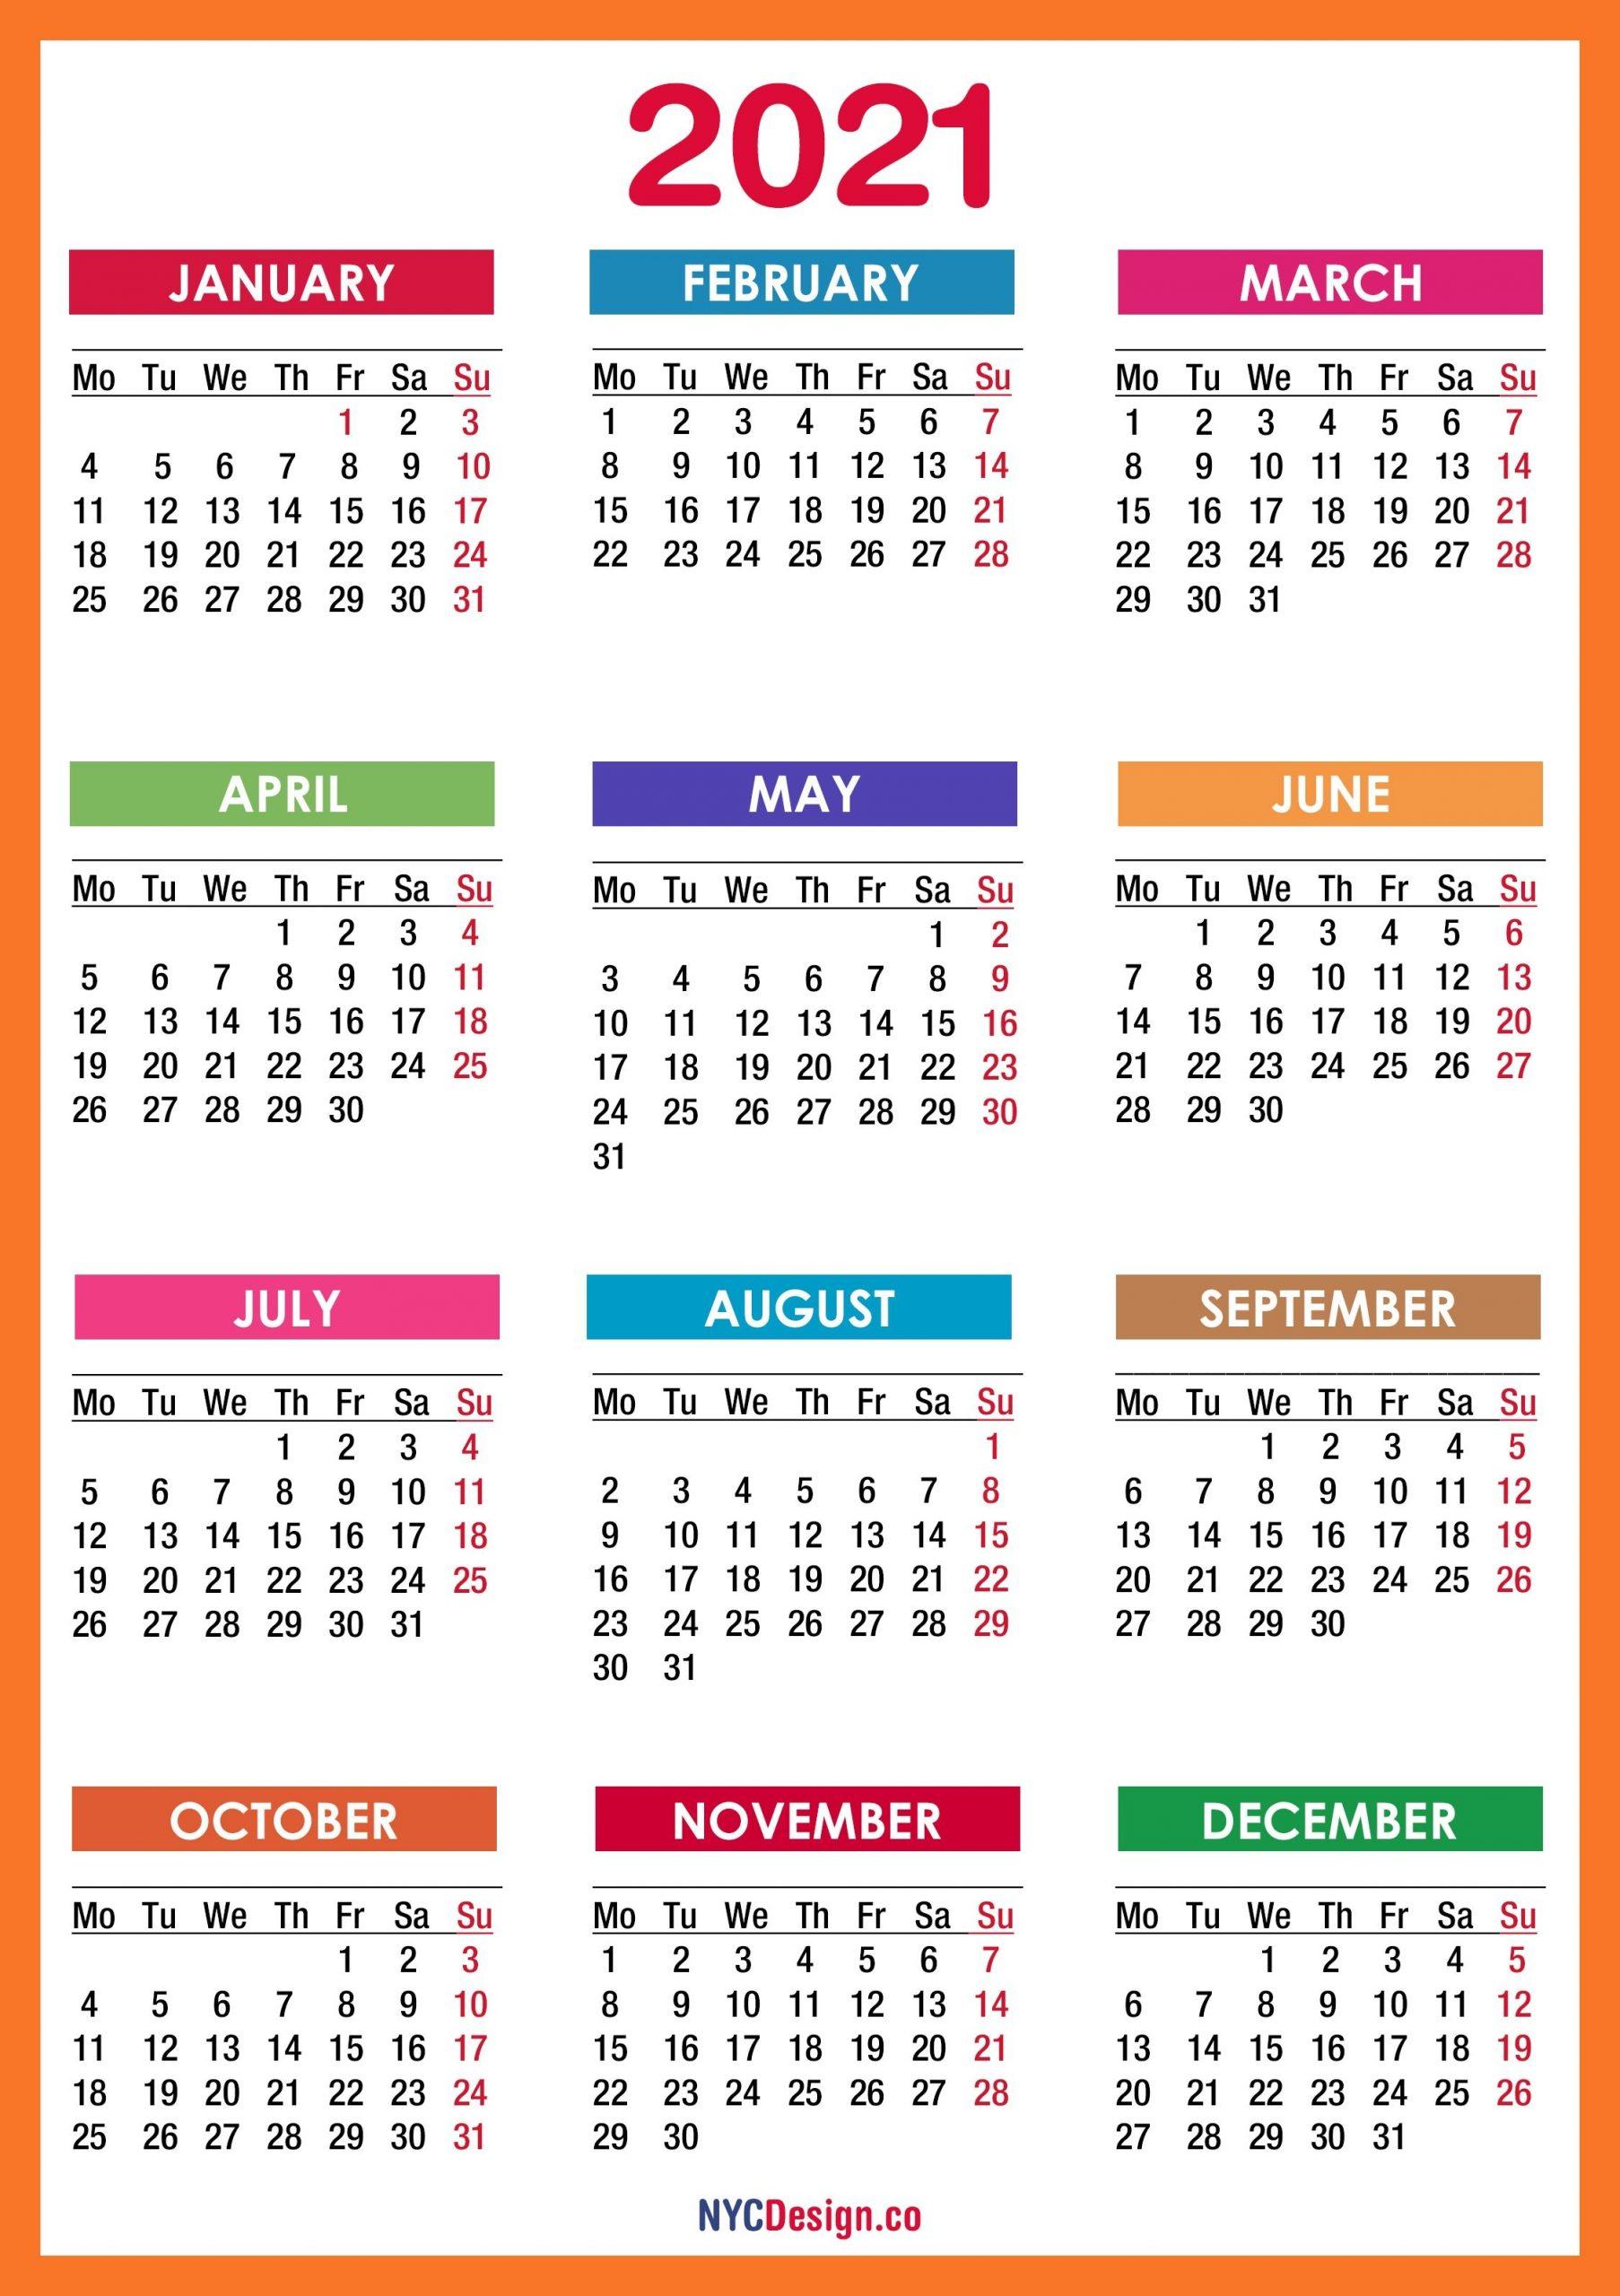 2021 Calendar Printable Free, Pdf, Colorful, Red, Orange